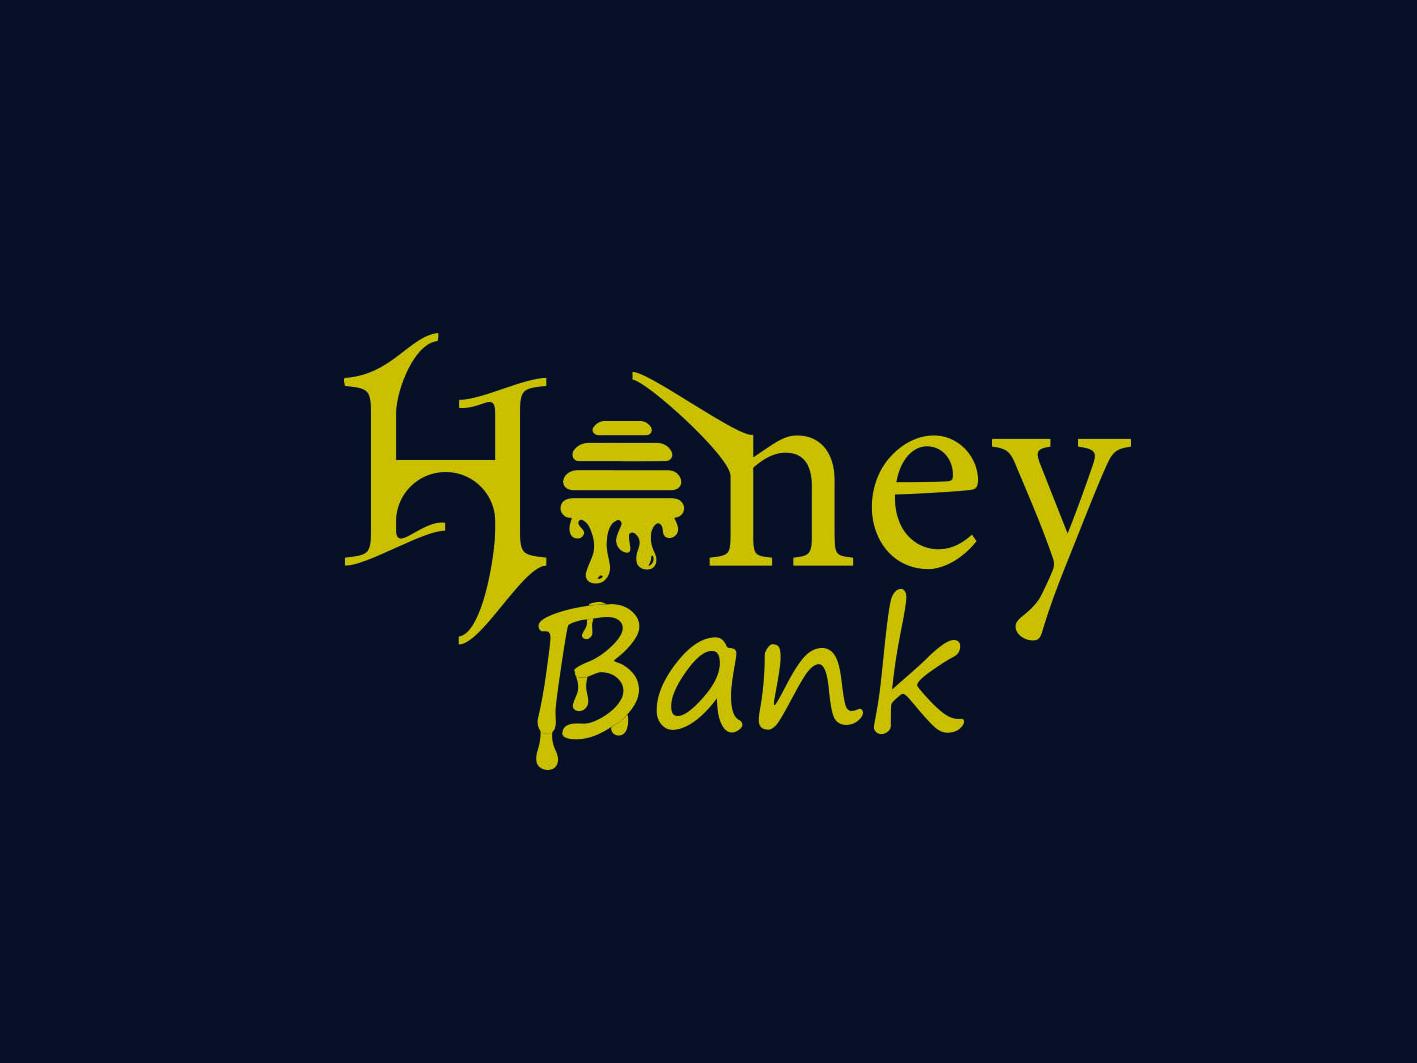 Logo Design minimalist business logo honey modern logos custom logo concept branding creative illustration 2d art logo design color branding design typogaphy logotype identity design art logo